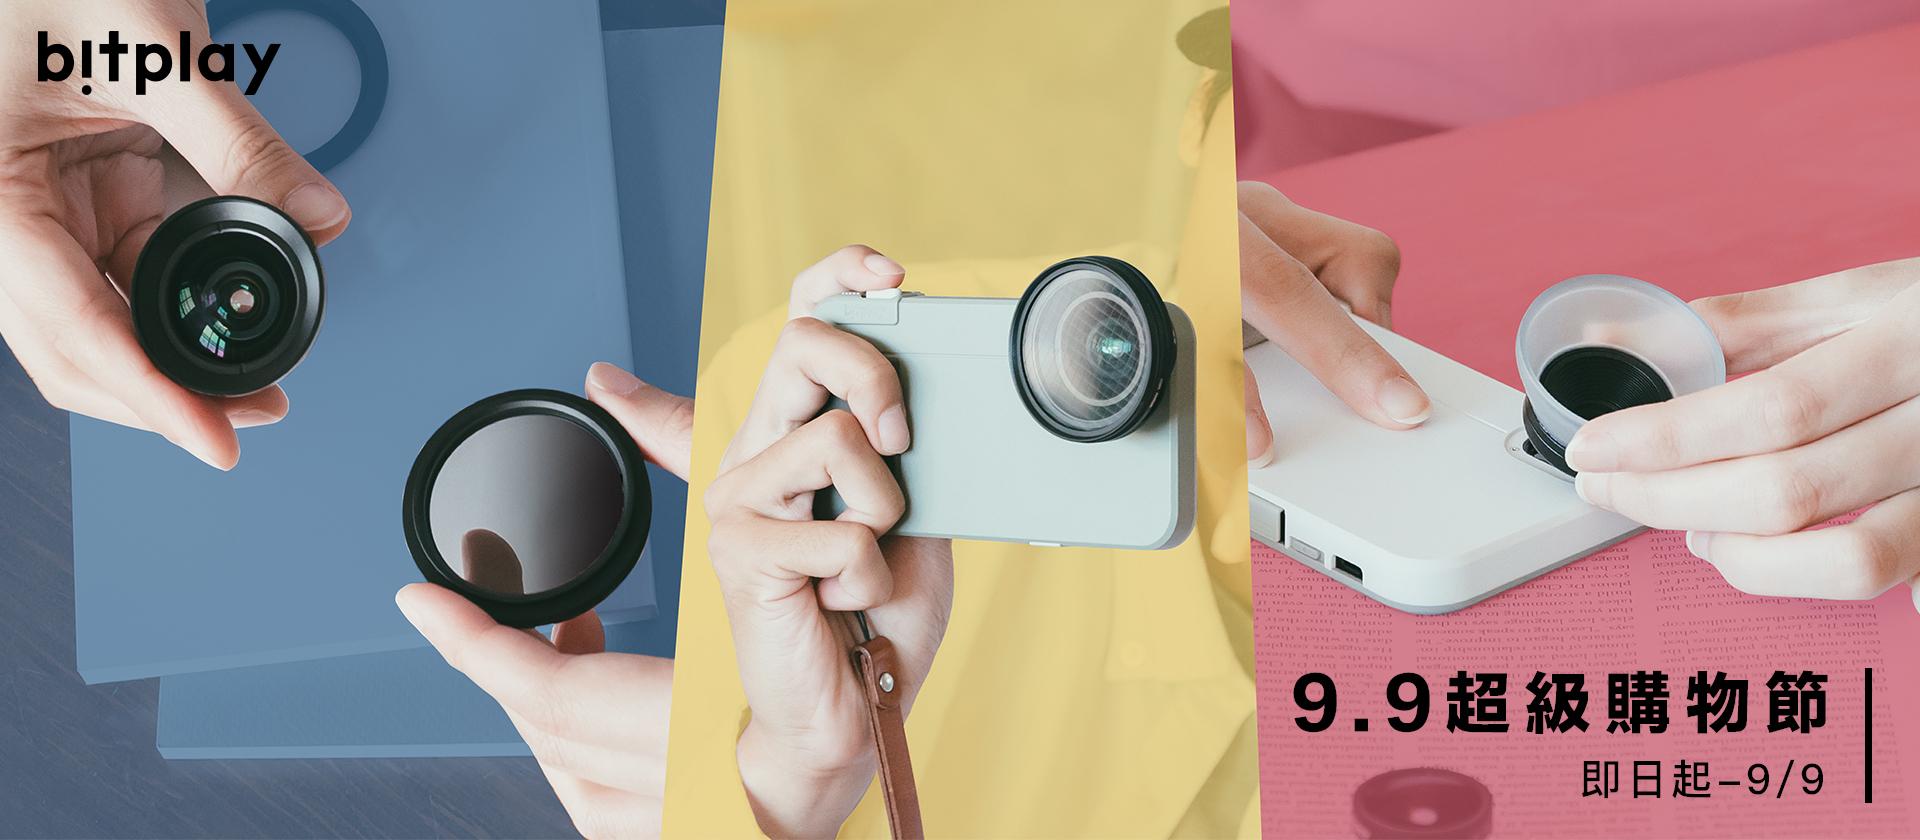 bitplay 促銷 品牌日 手機鏡頭 拍照 照片 手機包 包包 斜背包 推薦